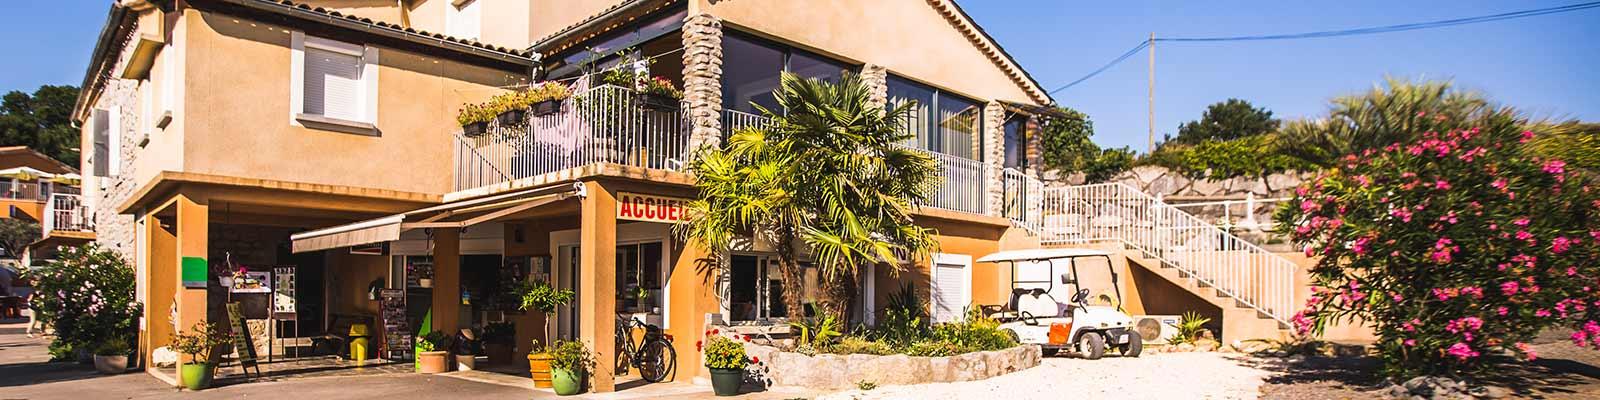 Entdeckungstour durch den Campingplatz Chapoulière in der Ardèche